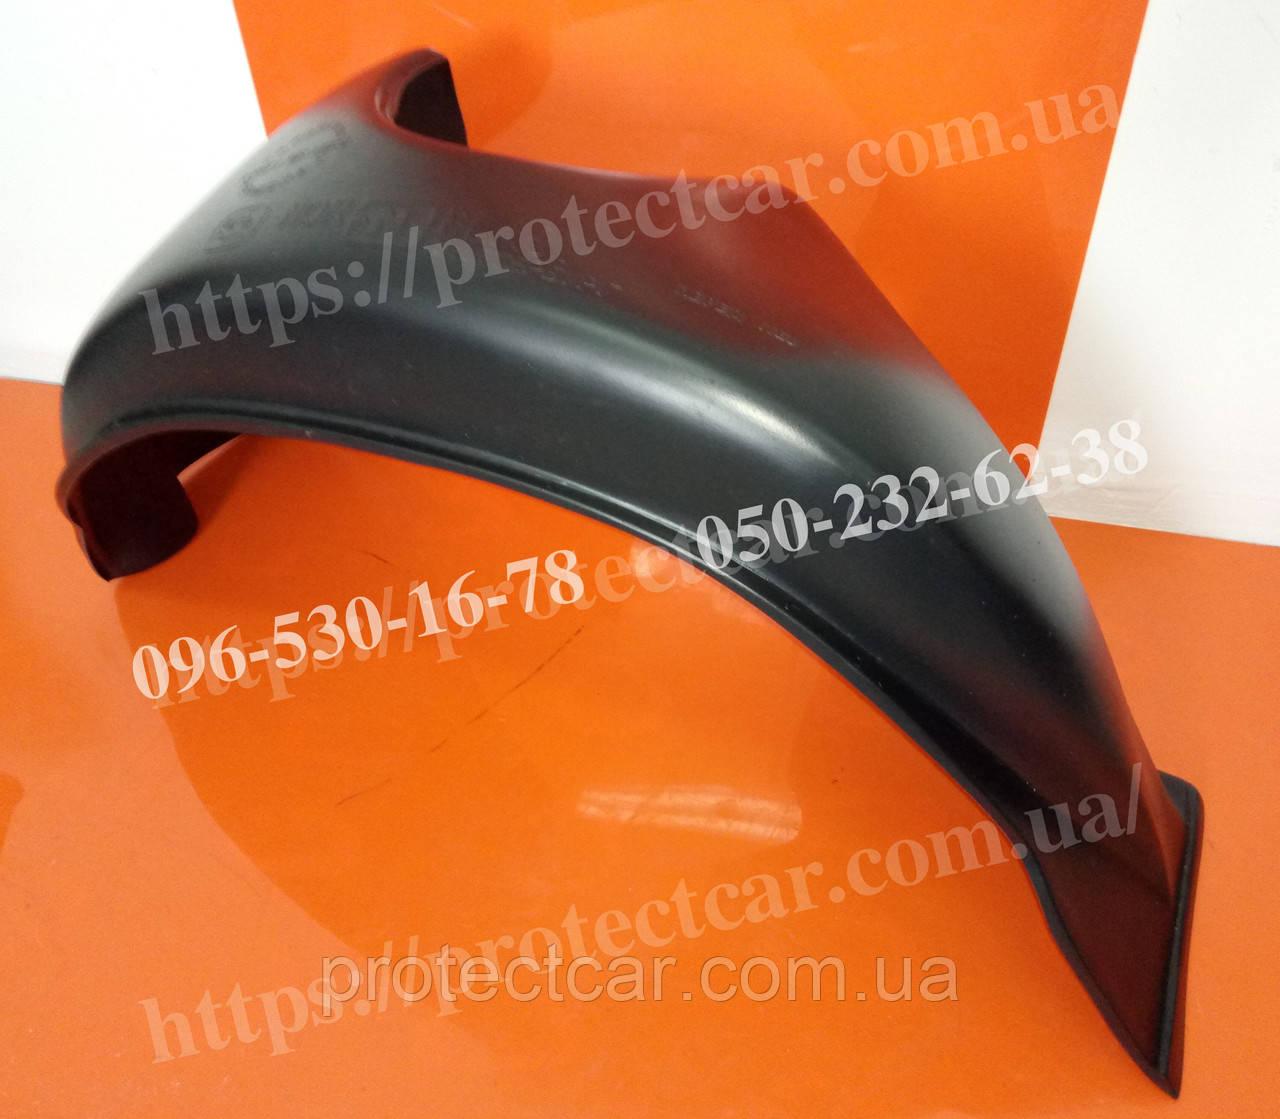 Защита арок ВАЗ 2109 передние подкрылки